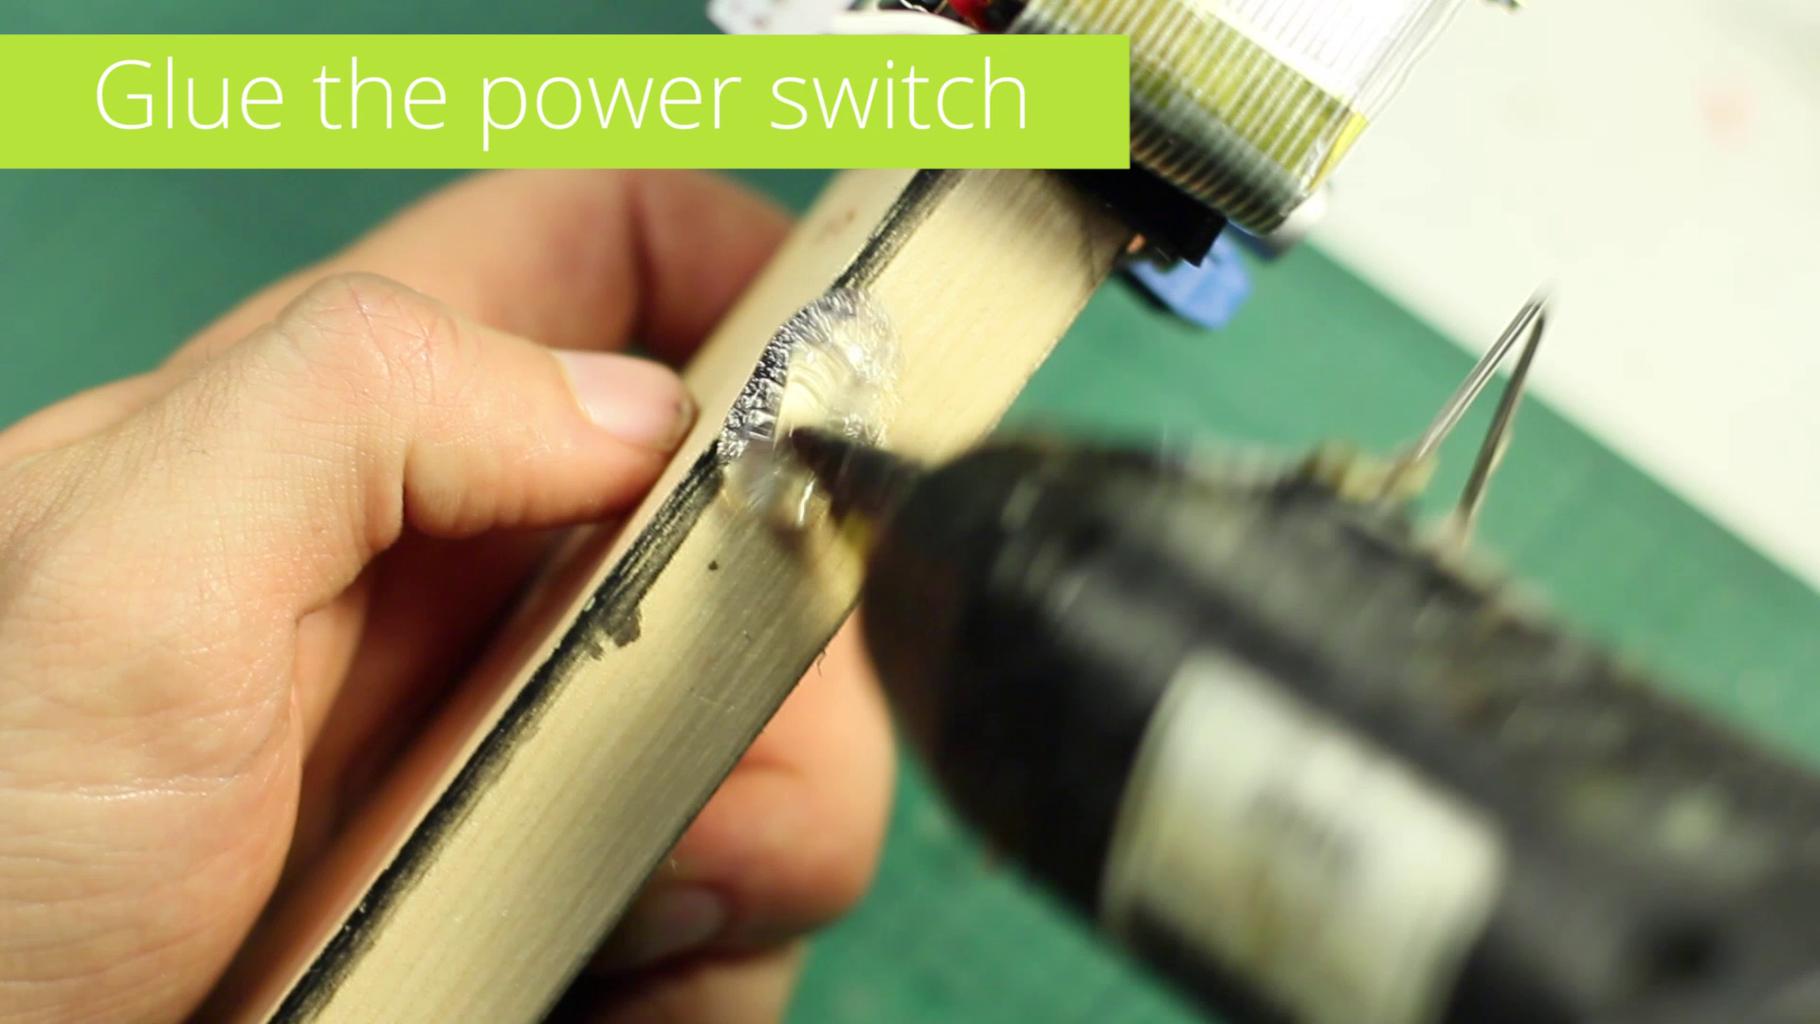 Glue the Power Switch